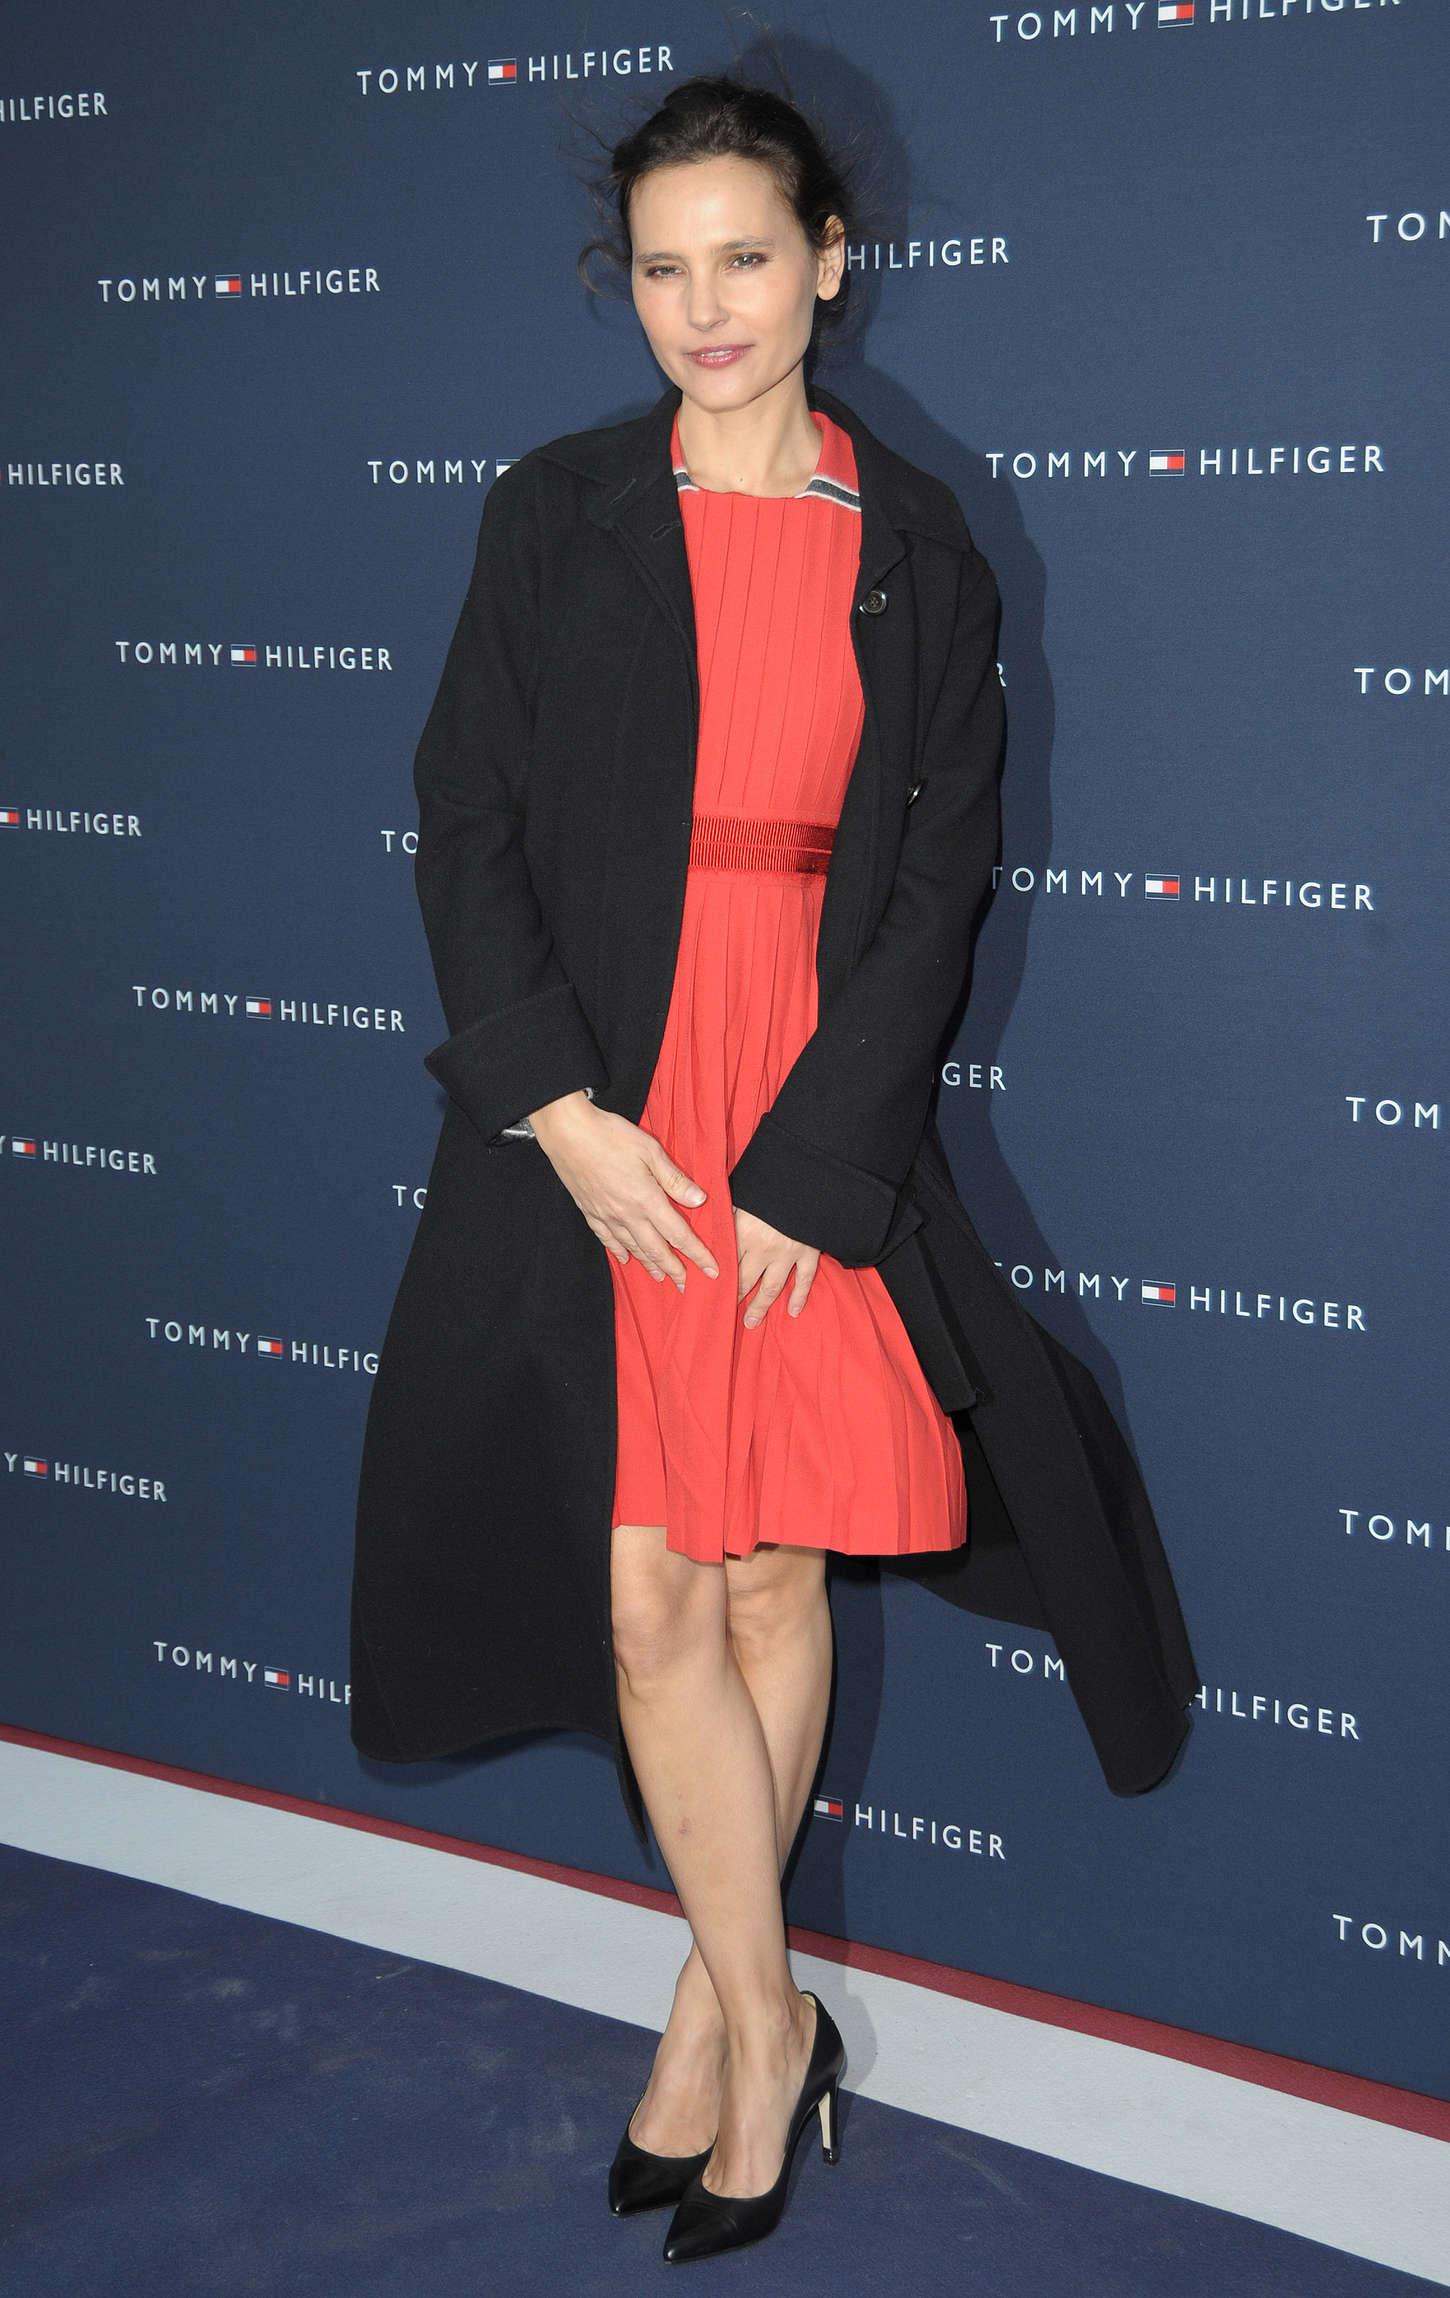 Virginie Ledoyen Tommy Hilfiger Boutique Opening Party in Paris